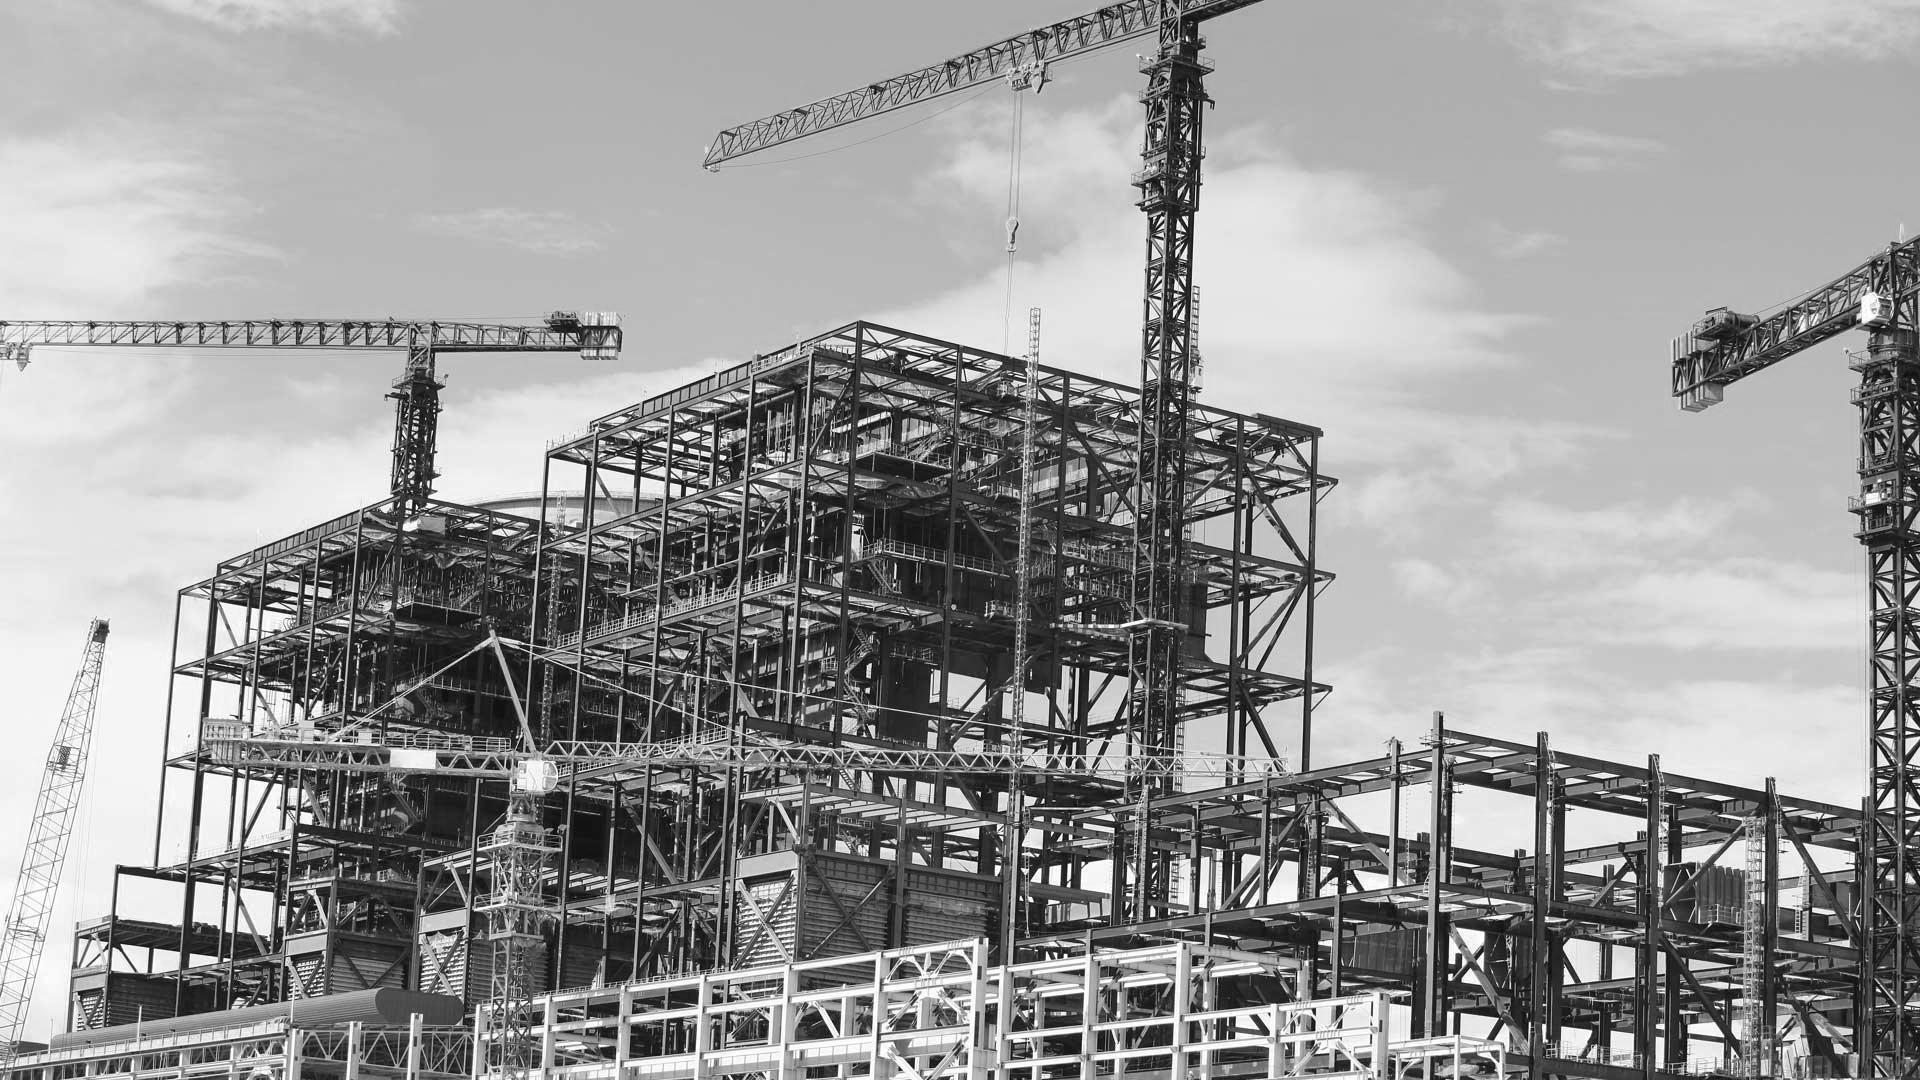 bg-construction-site